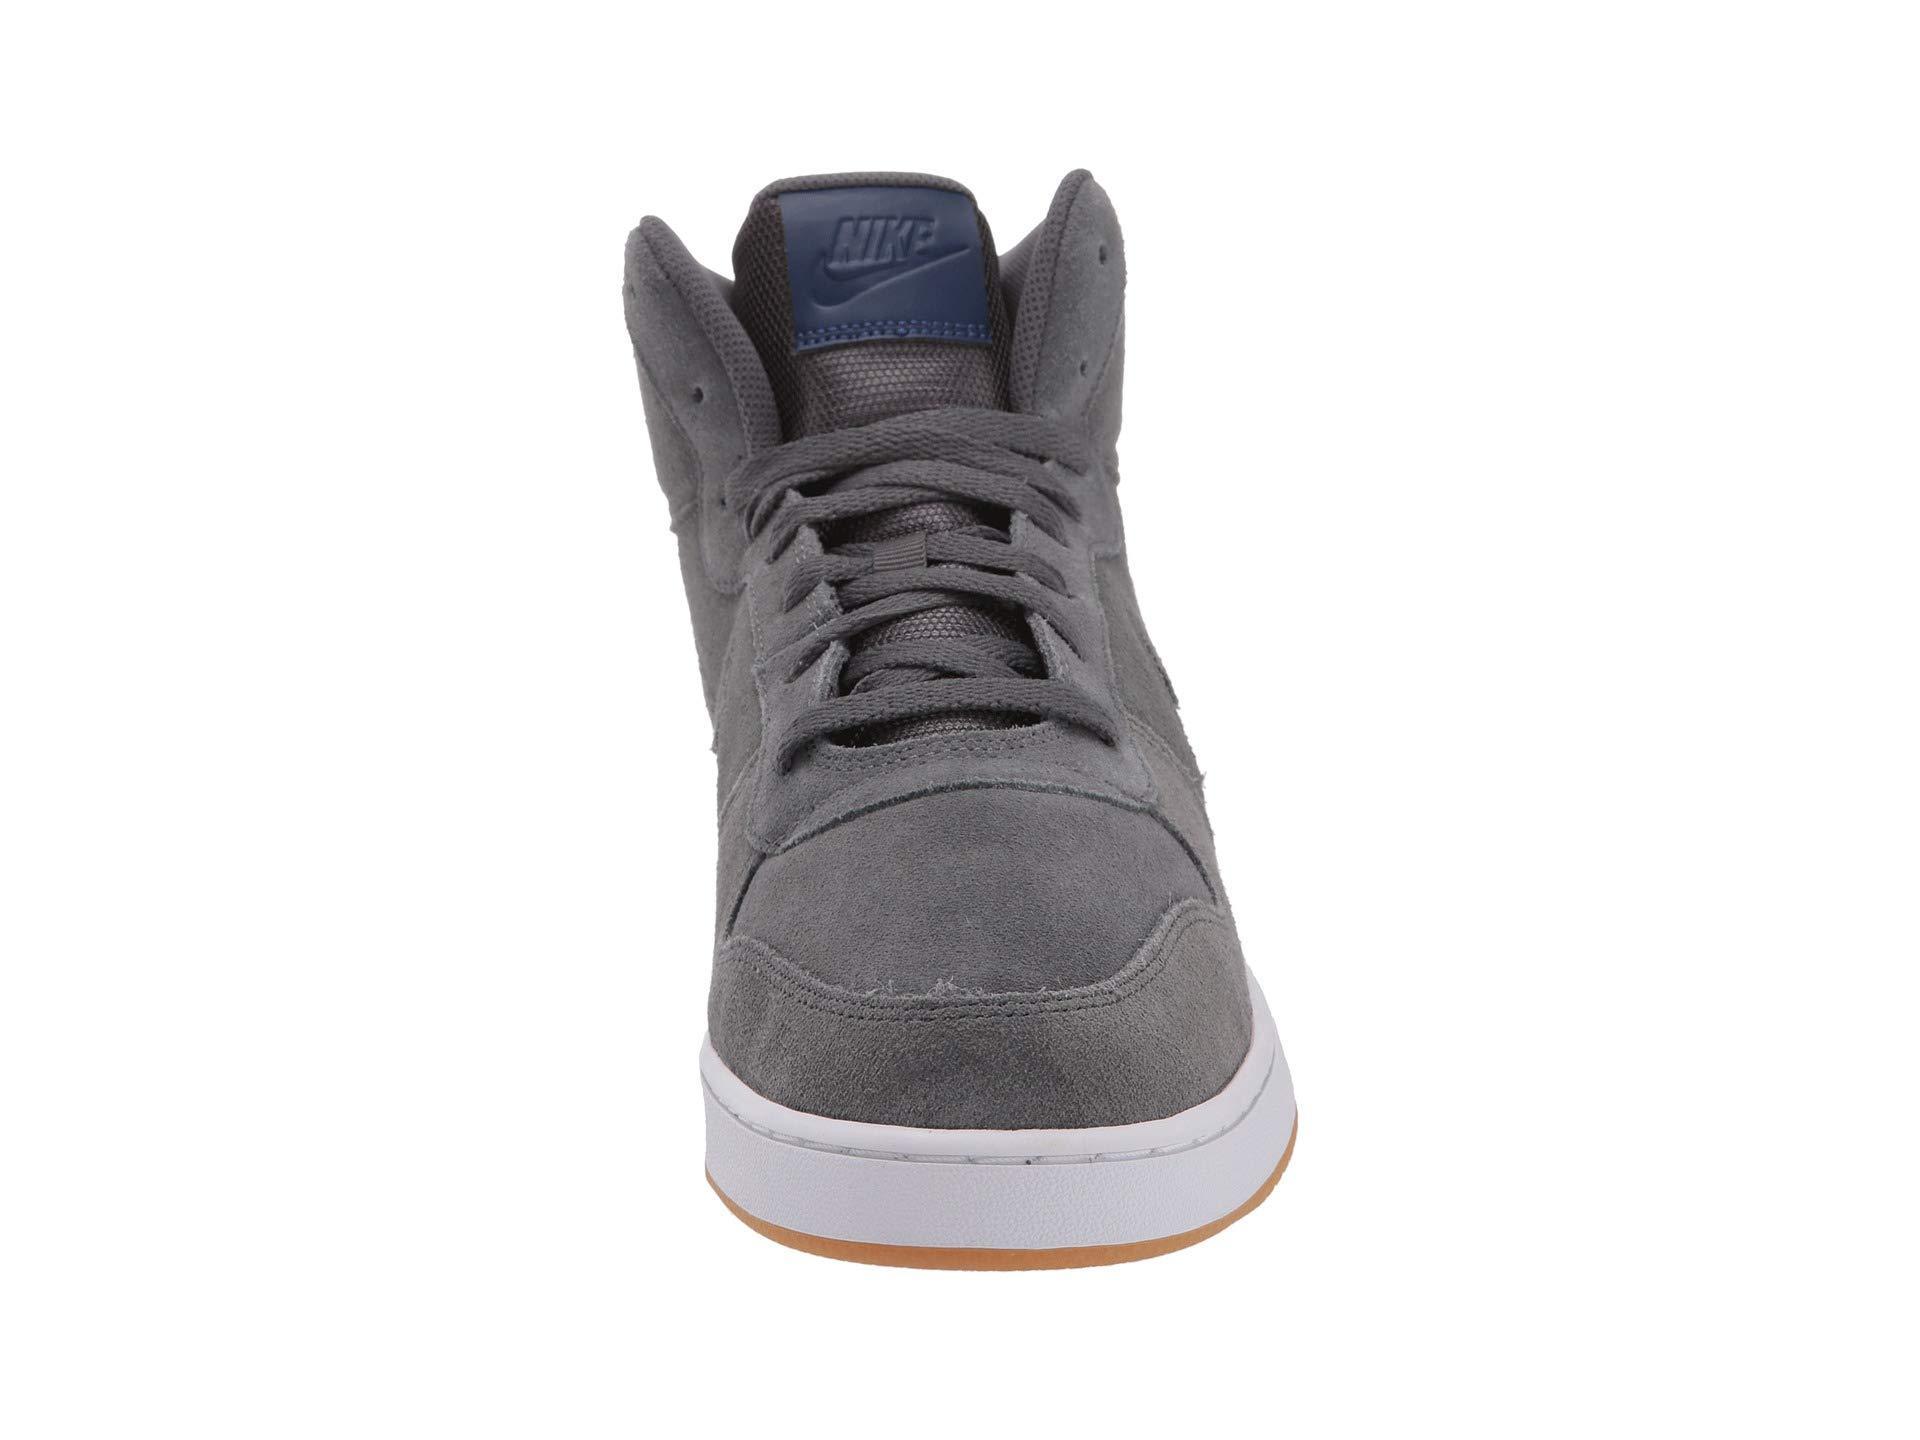 6a51d3f763 Nike Ebernon Mid Premium (dark Grey/blue Void/white) Men's Shoes in ...